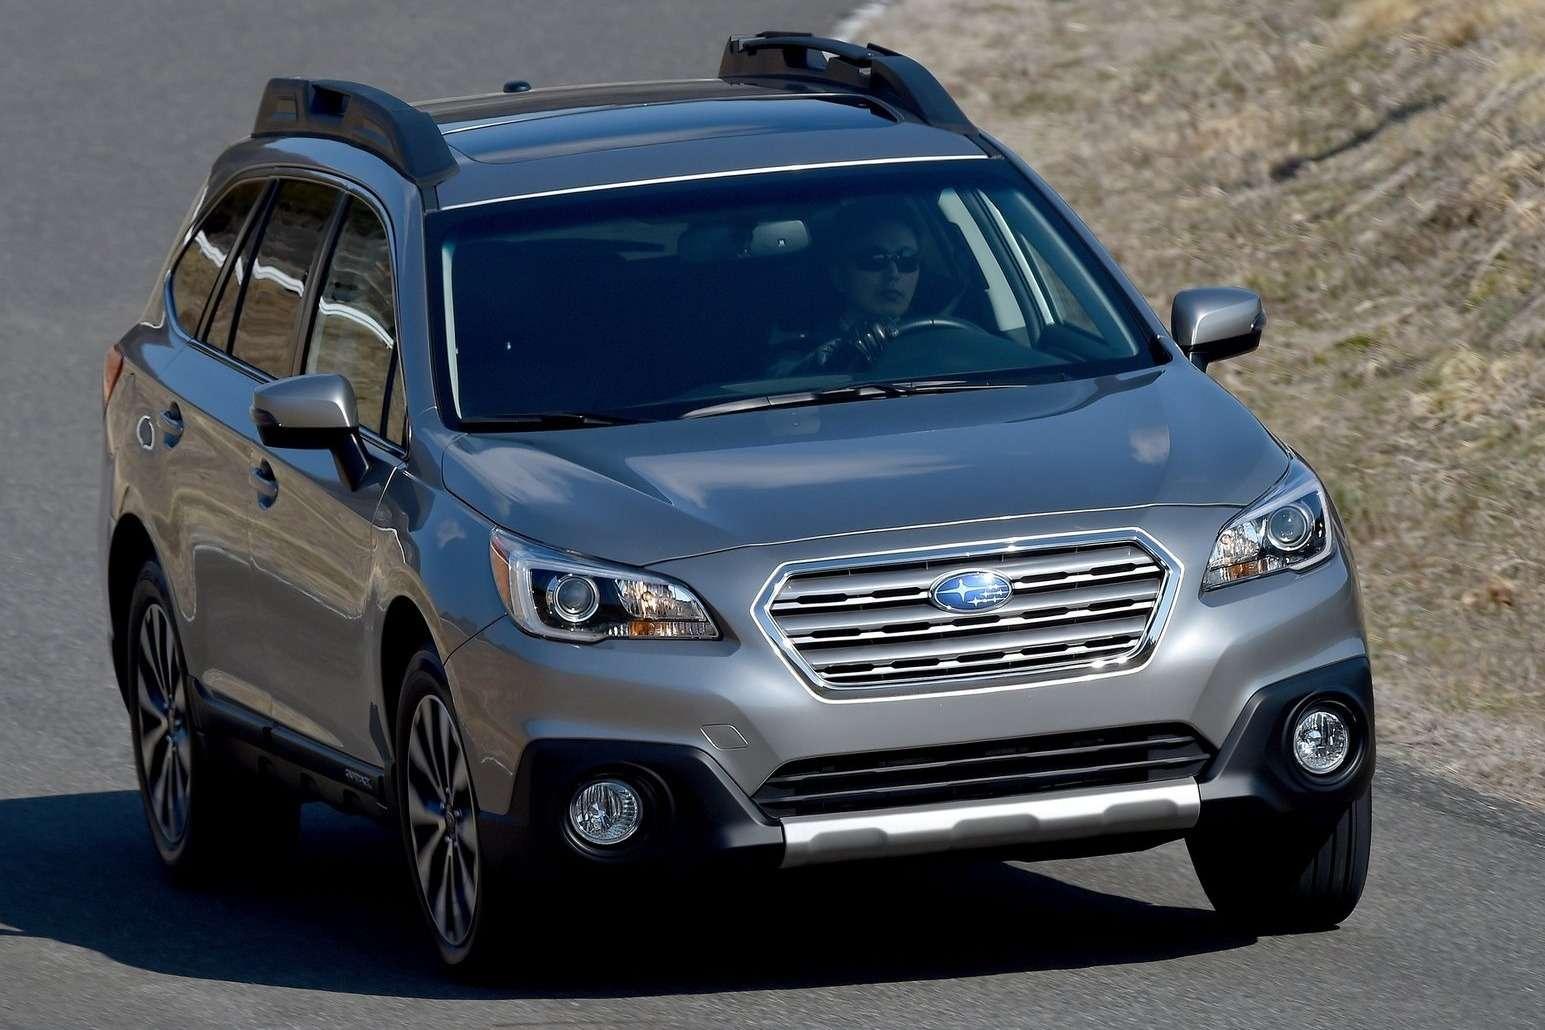 Subaru-Outback_2015_1600x1200_wallpaper_0e